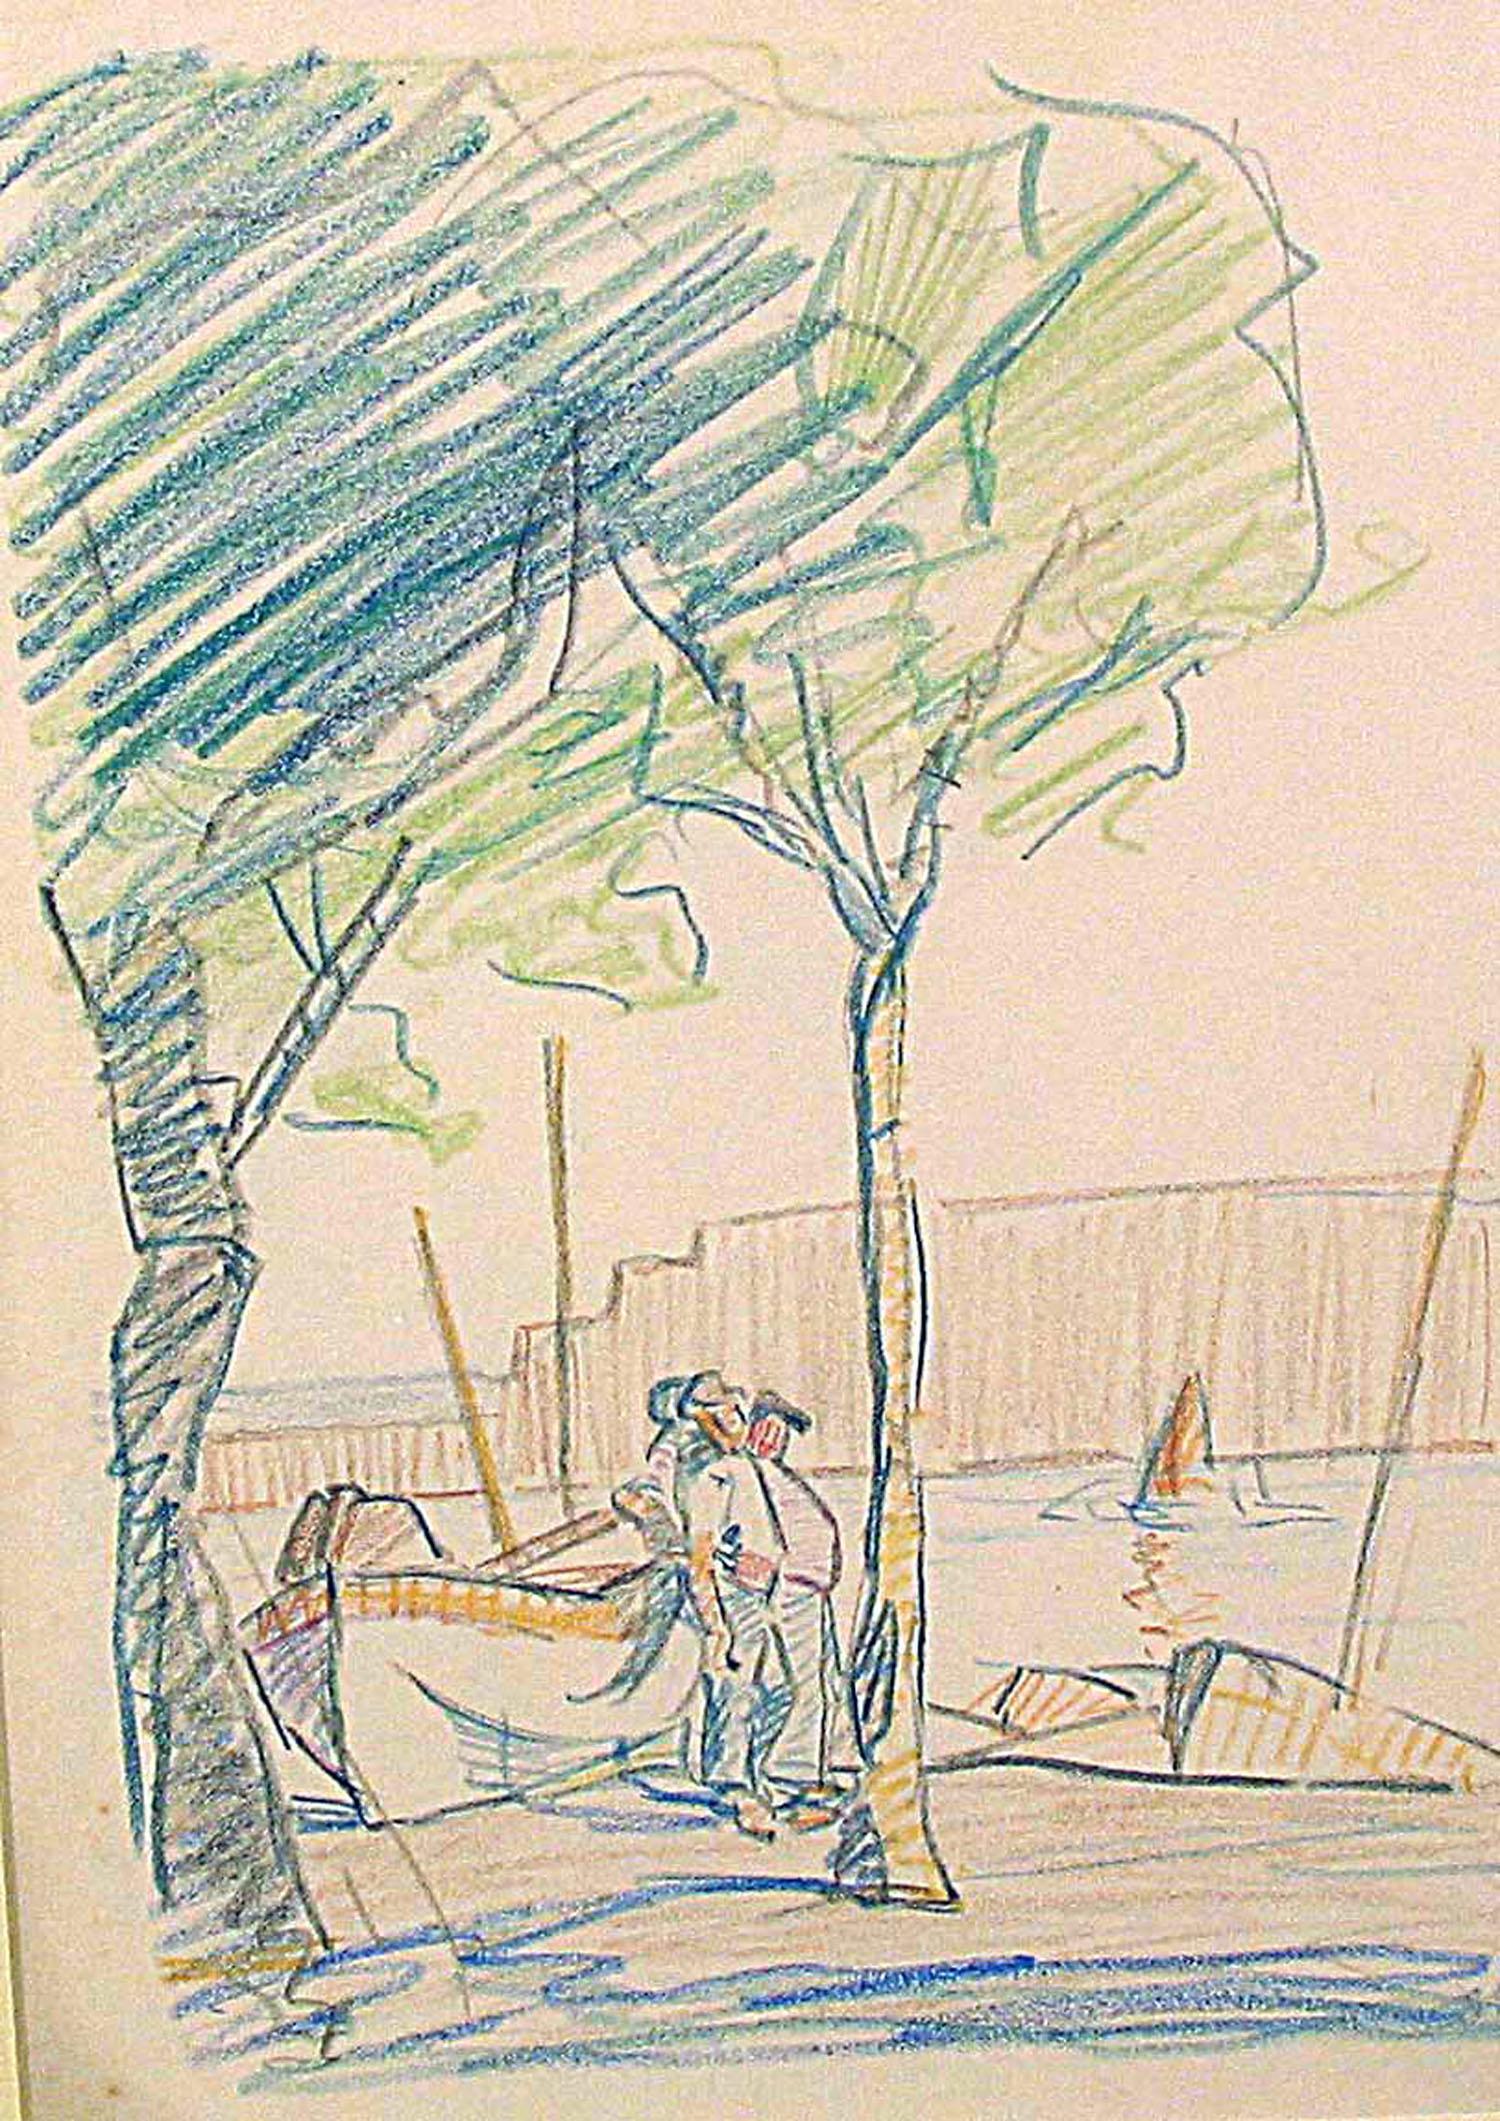 Mary Swanzy_c. 1919_Boatmen.jpg